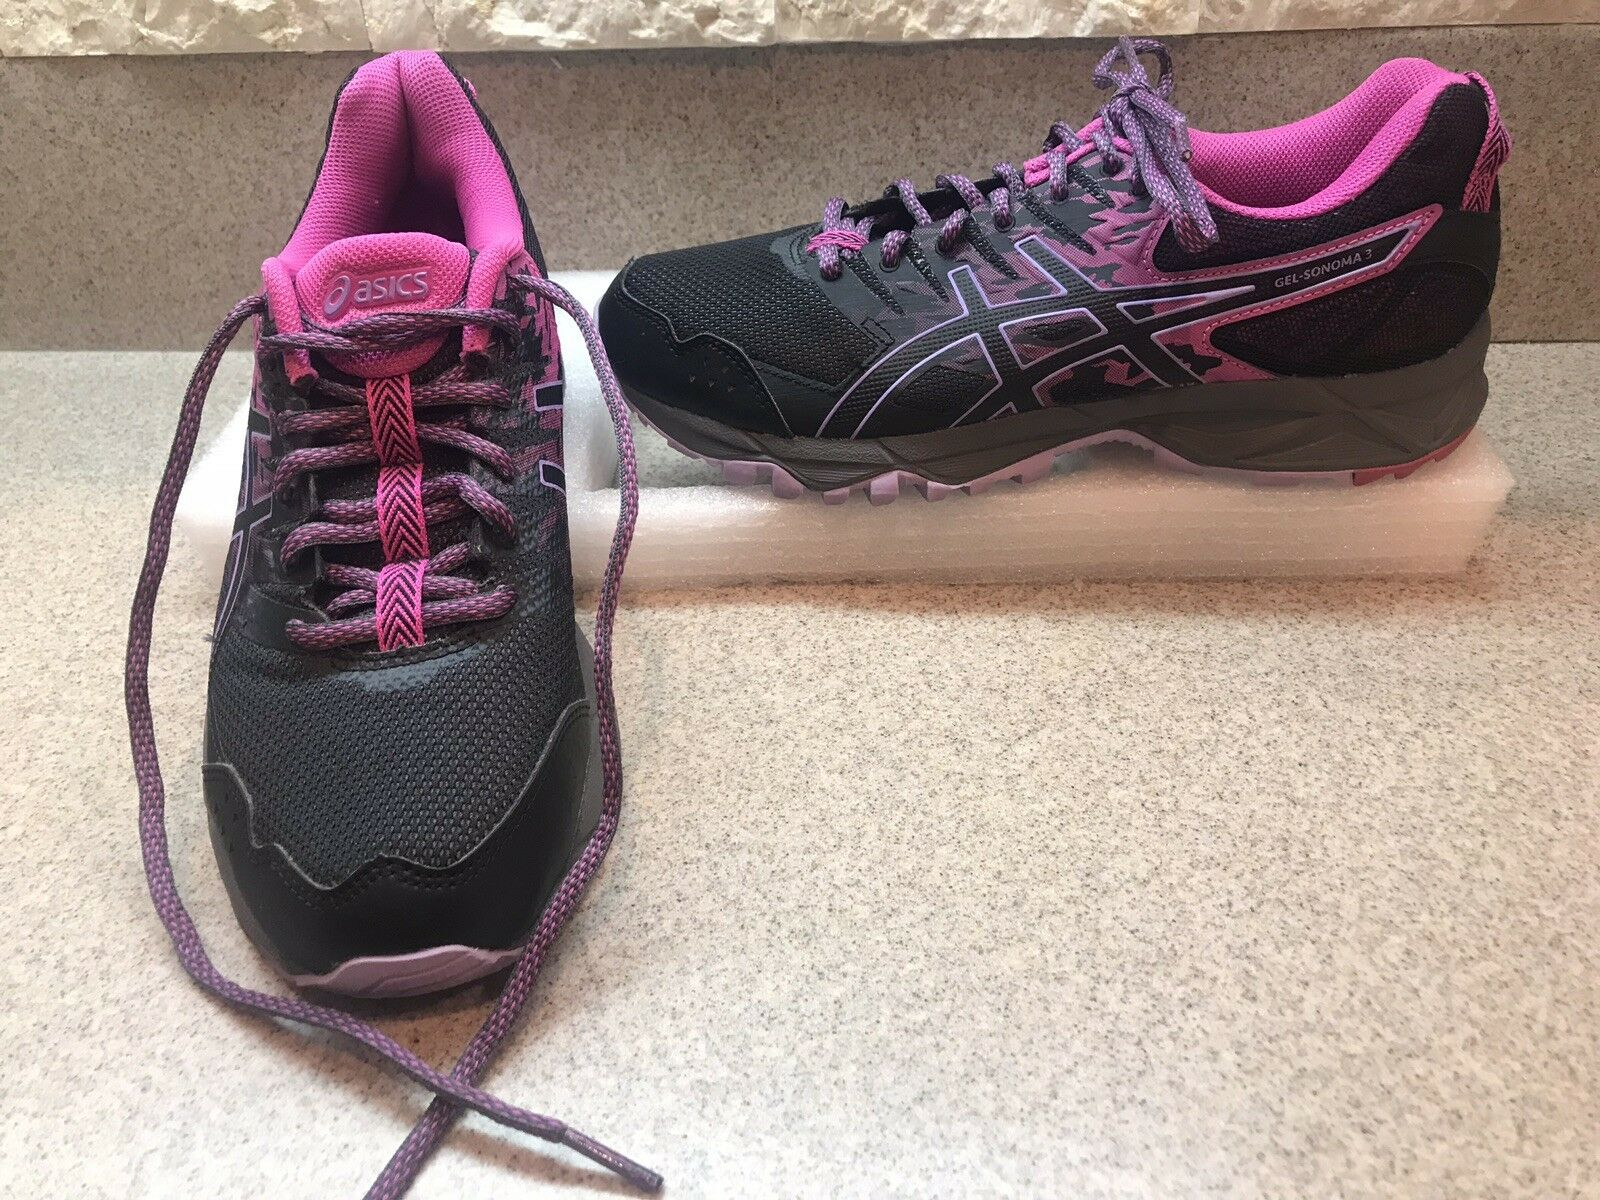 Womens Pink Black Lavender Asics GEL-Sonoma 3 Trail Running shoes Women's Sz 8